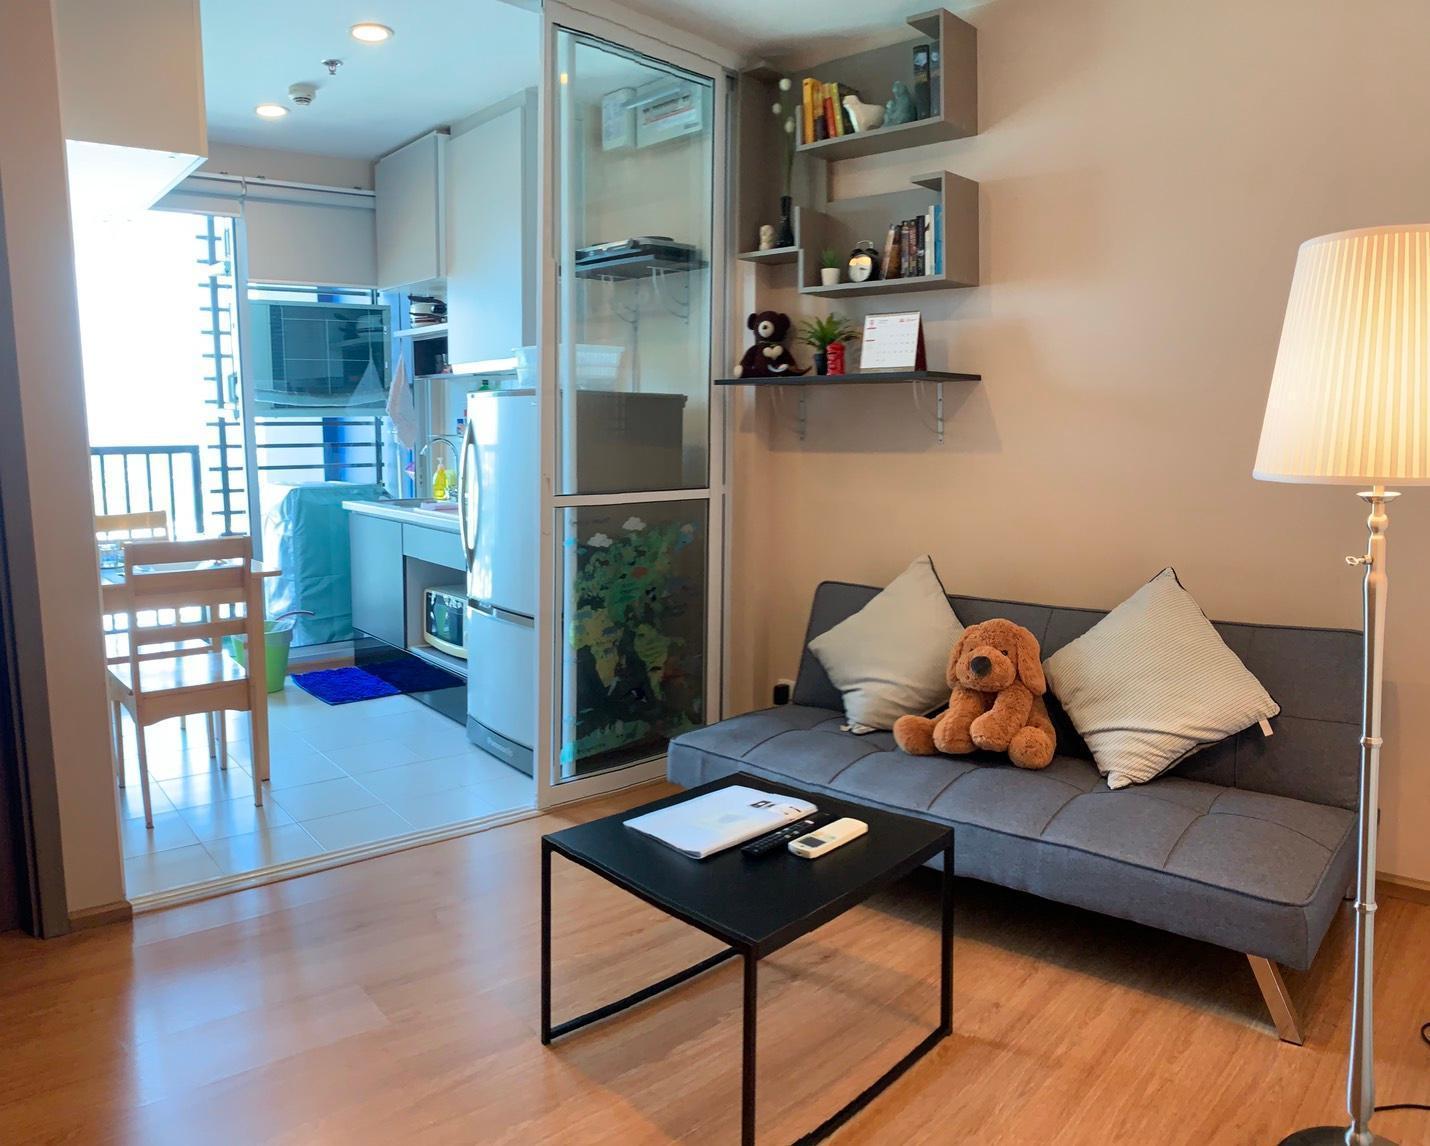 Onnut to the city center and relax in one place. อพาร์ตเมนต์ 1 ห้องนอน 1 ห้องน้ำส่วนตัว ขนาด 30 ตร.ม. – สุขุมวิท